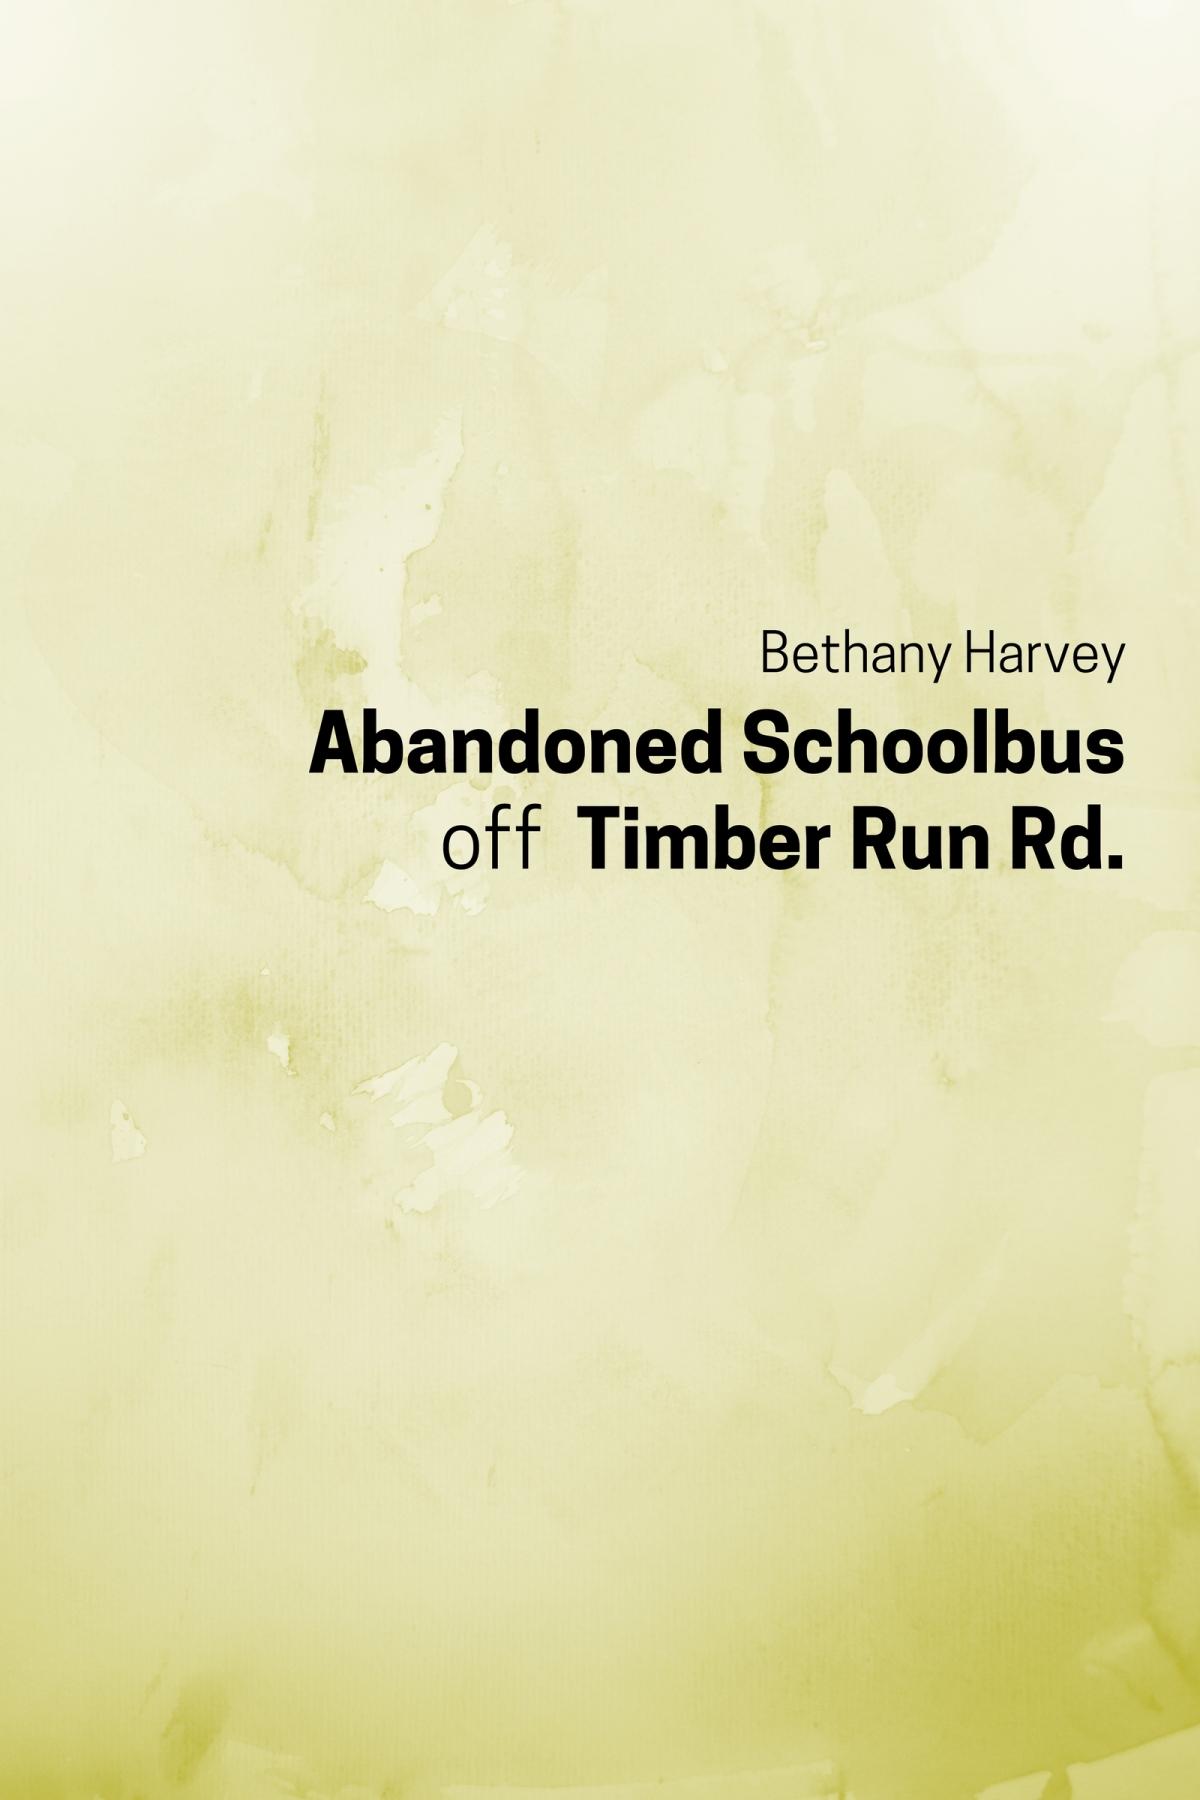 Abandoned Schoolbus off Timber RunRd.